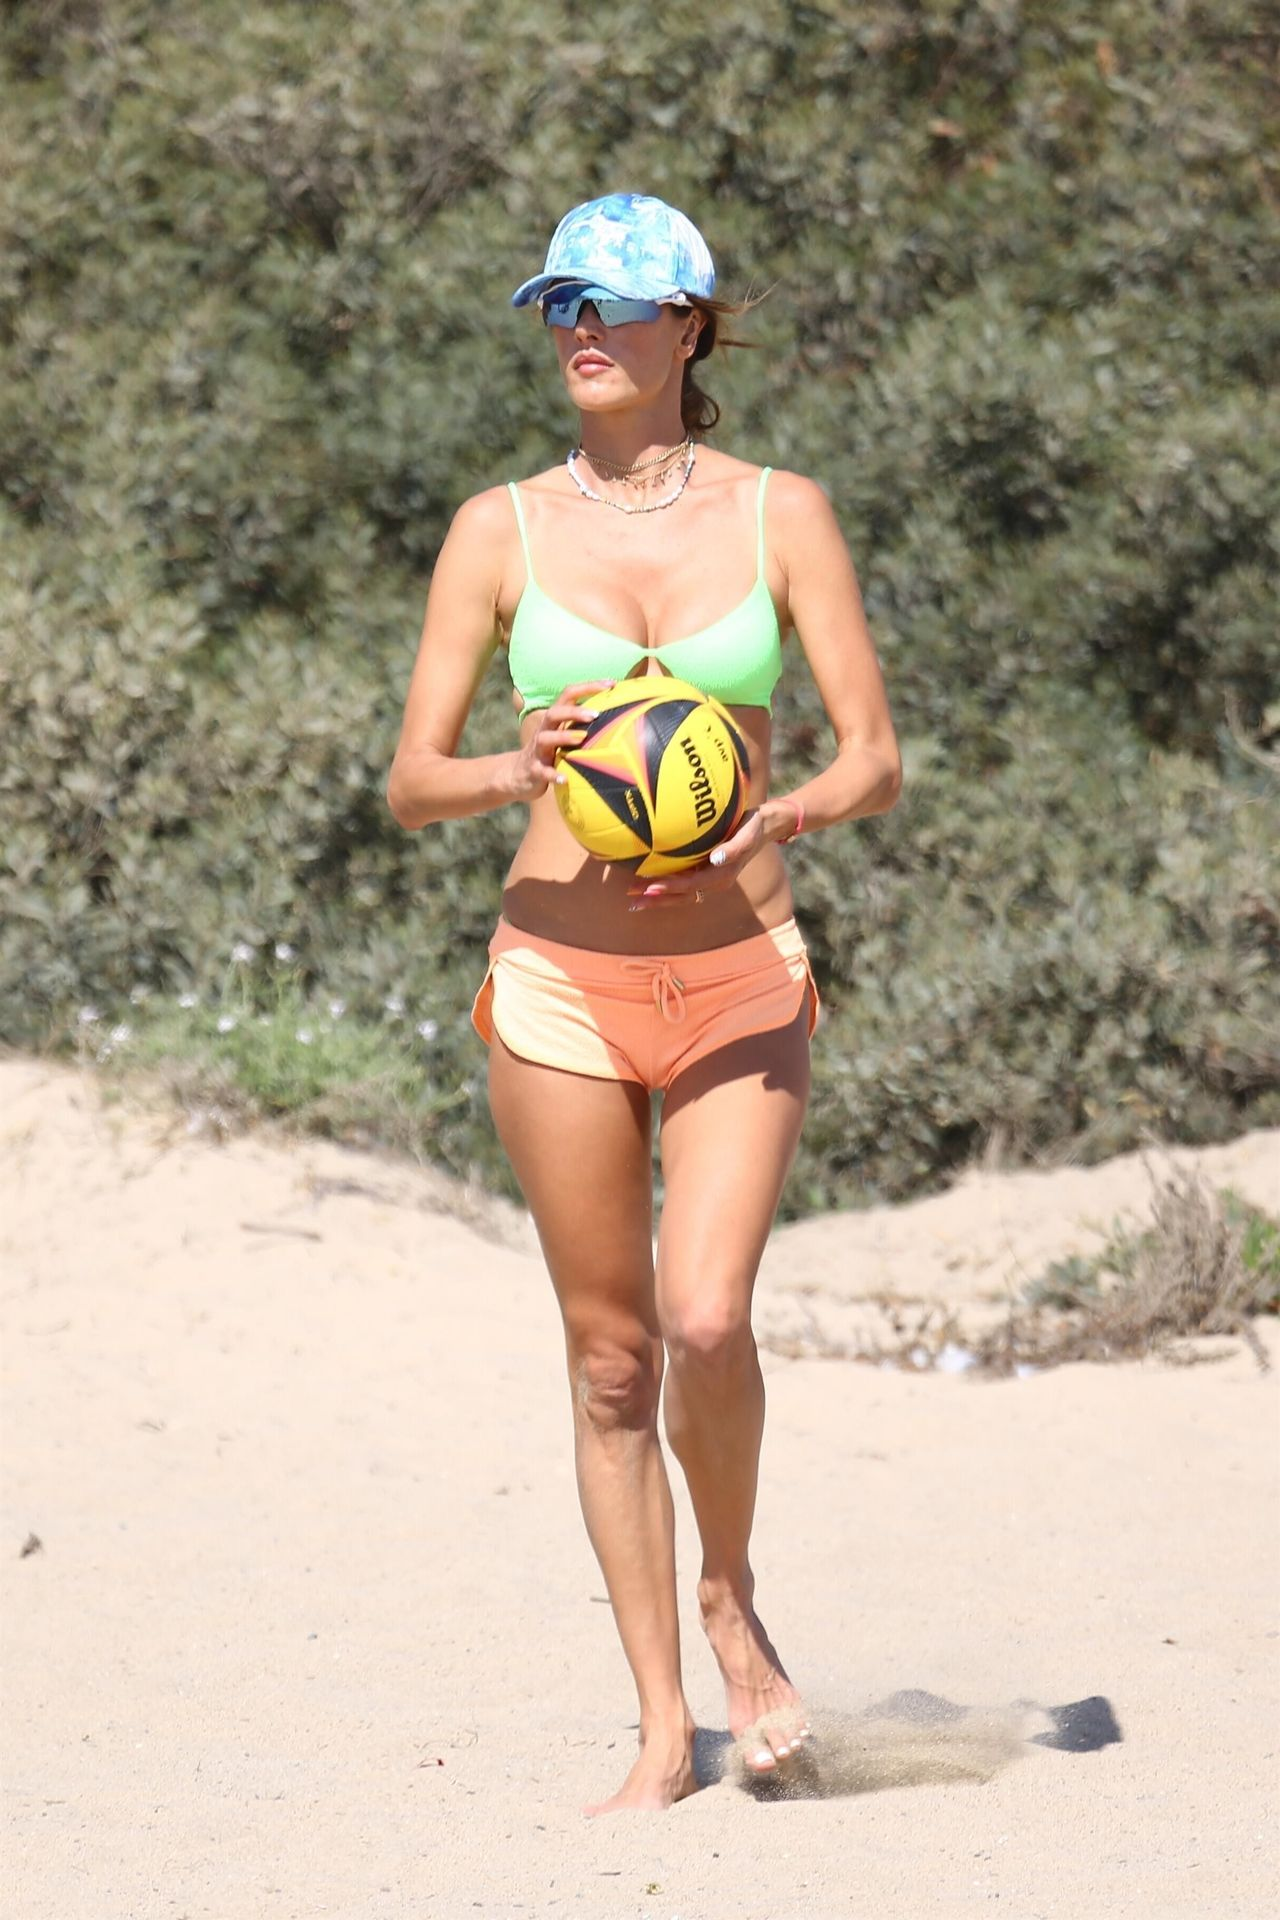 Alessandra-Ambrosio-Sexy-The-Fappening-Blog-181.jpg